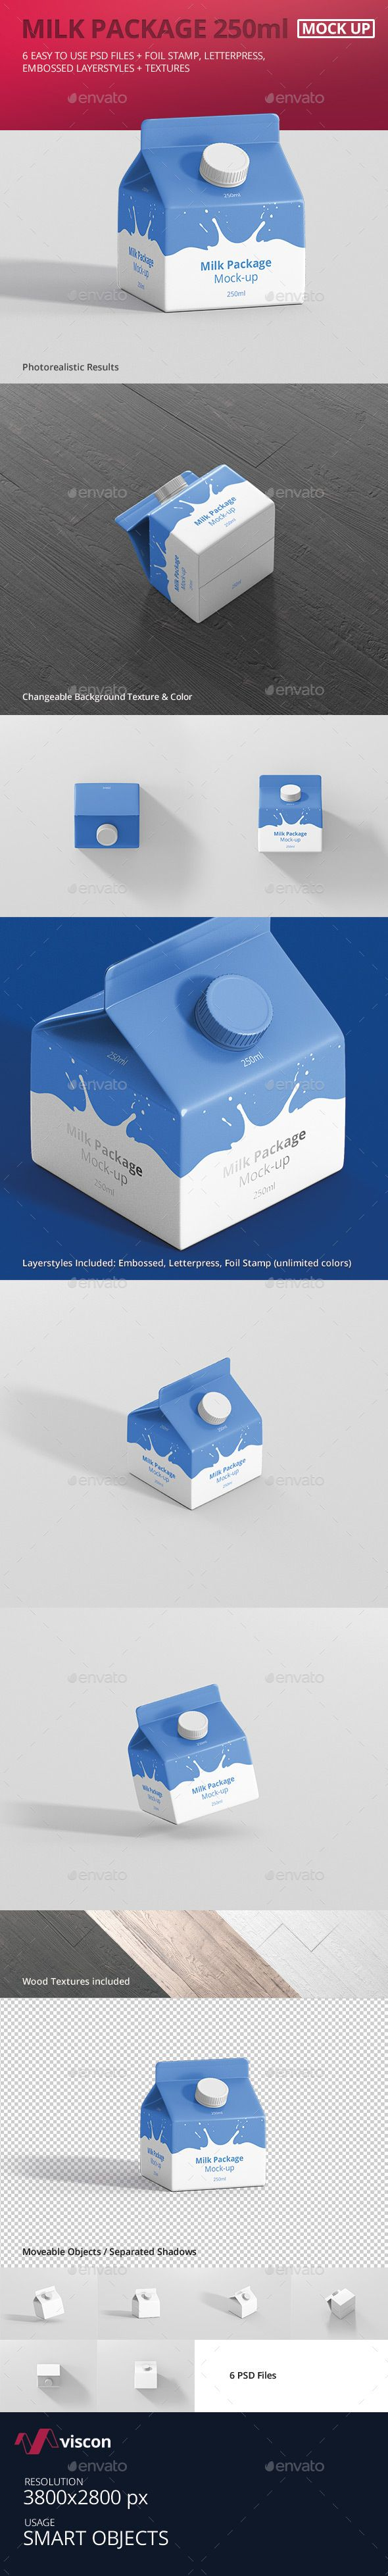 Juice / Milk Mockup - 250ml Carton Box